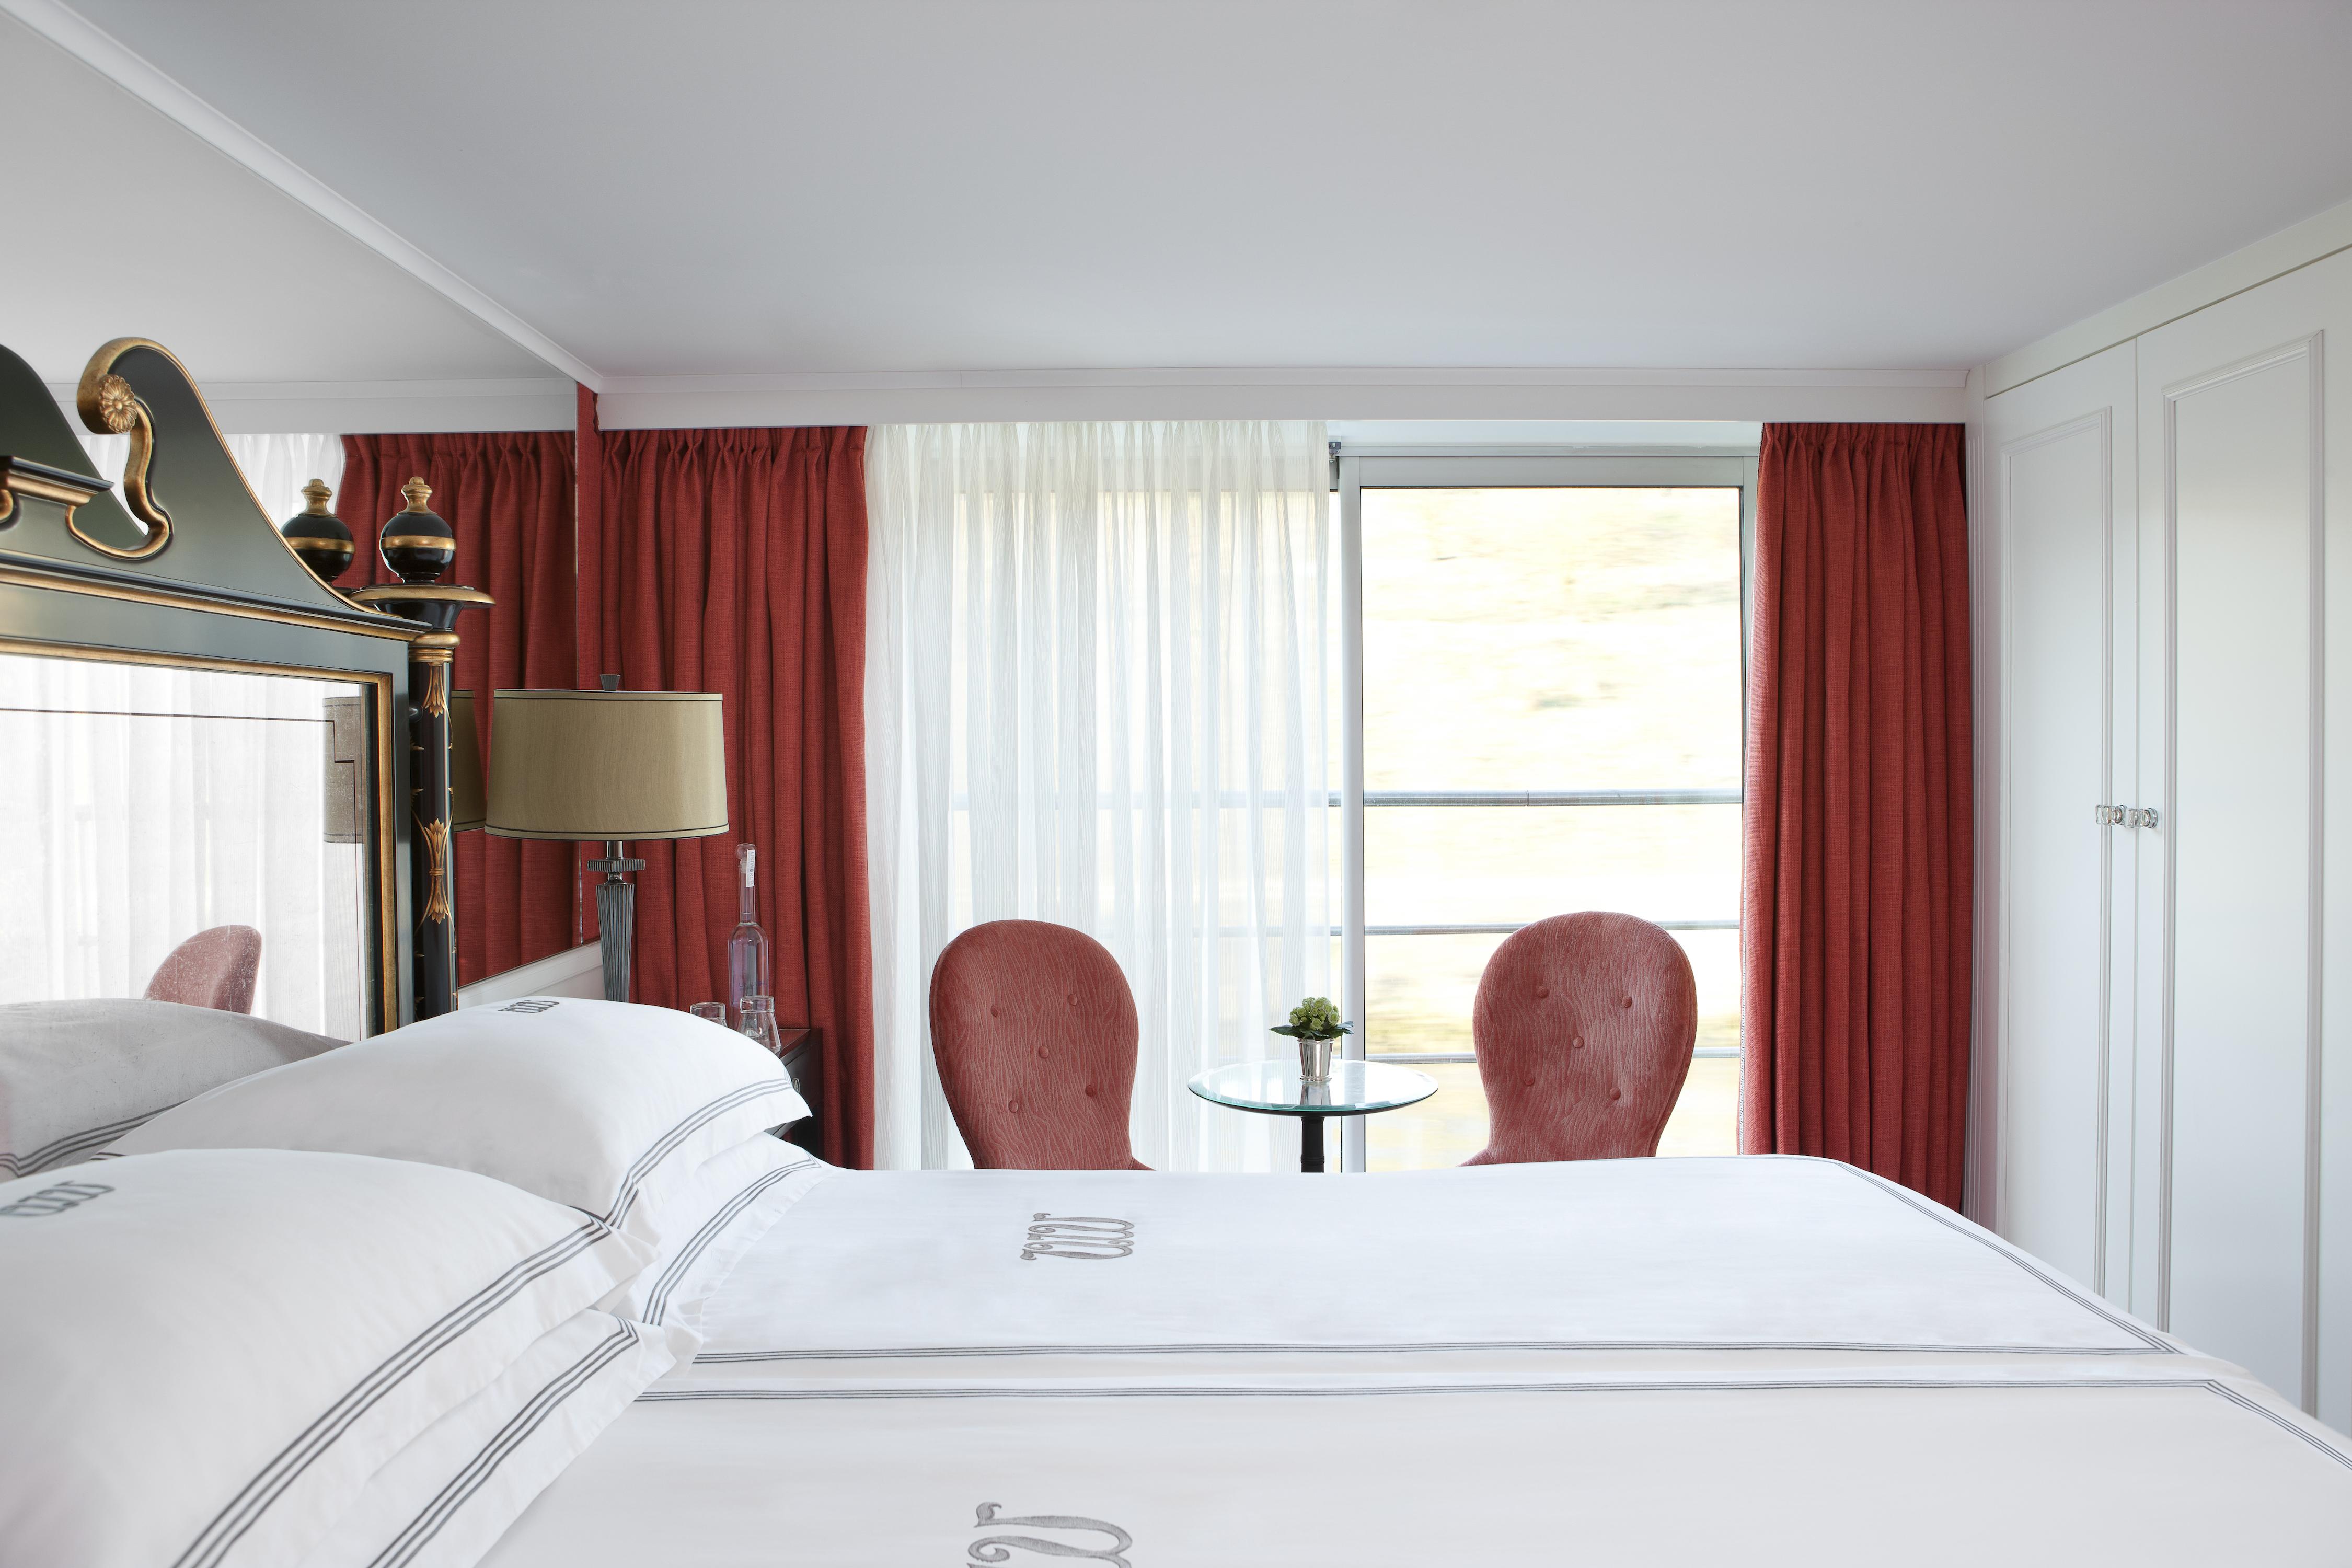 UNIWORLD Boutique River Cruises River Princess Accommodation Stateroom Category 1.jpg